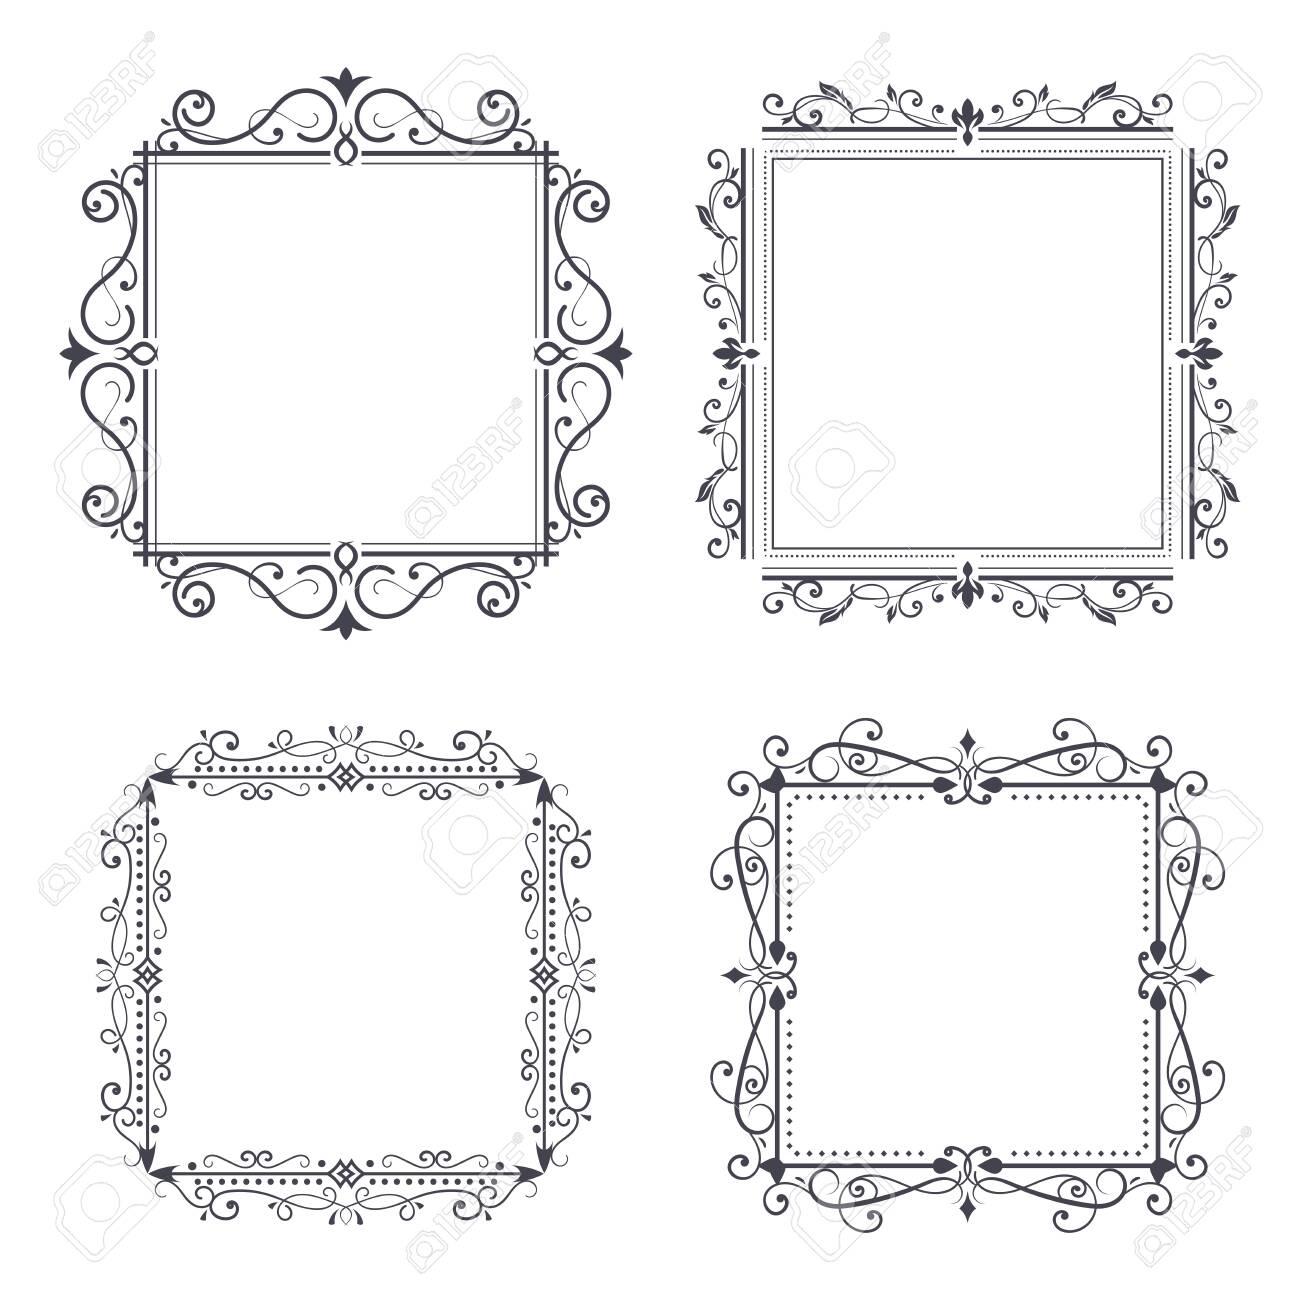 Vintage ornamental frames. Vector illustration isolated on white background - 141053472